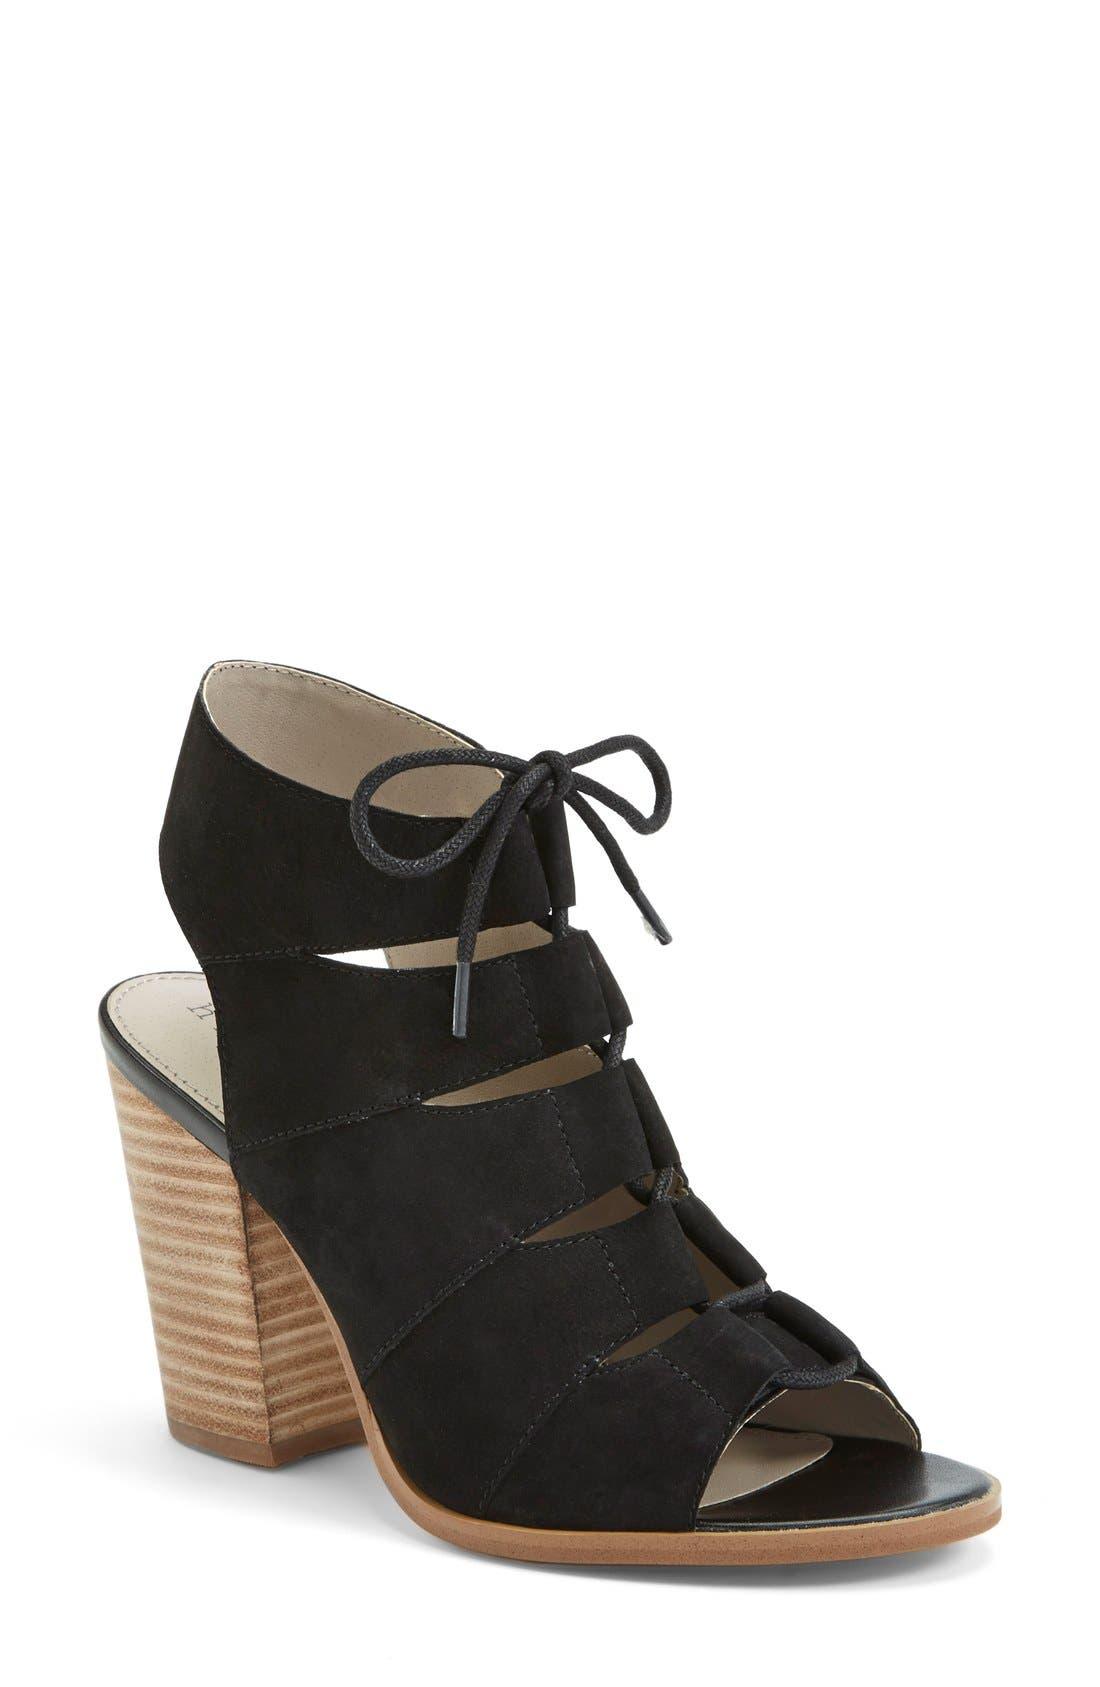 Alternate Image 1 Selected - Hinge 'Drea' Peep Toe Leather Sandal (Women)